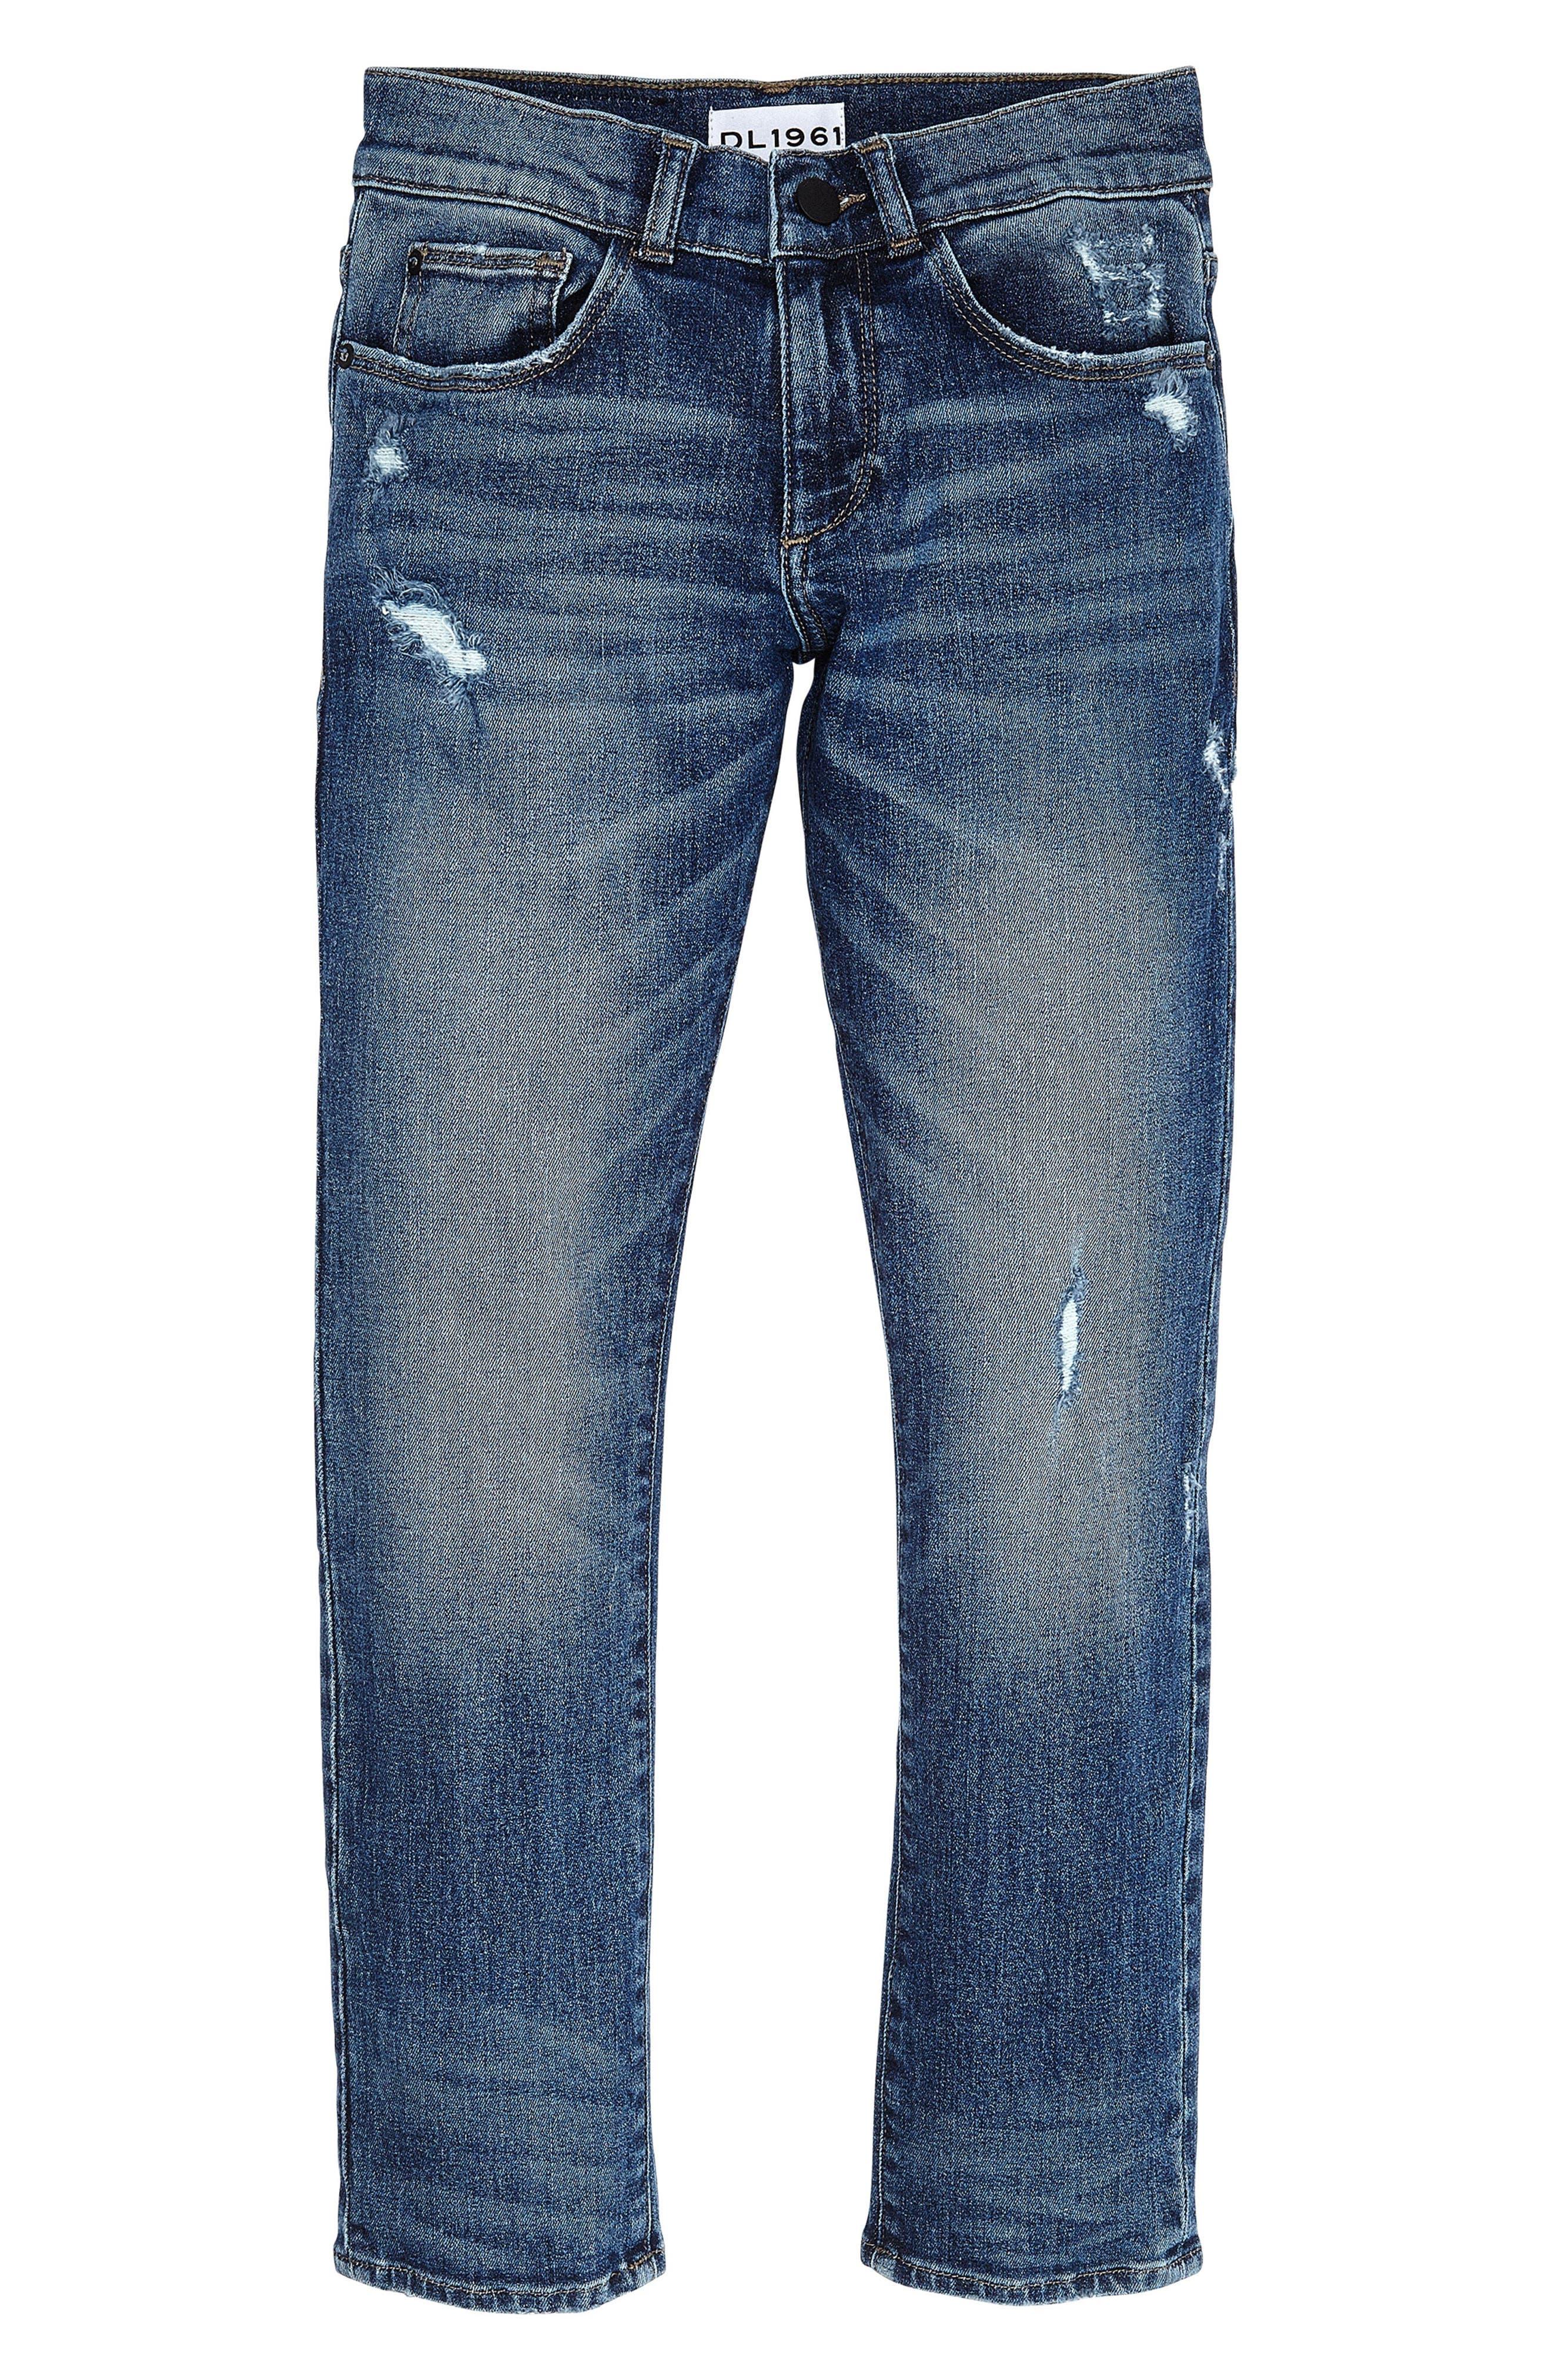 DL1961 Brady Slim Straight Leg Jeans (Big Boys)